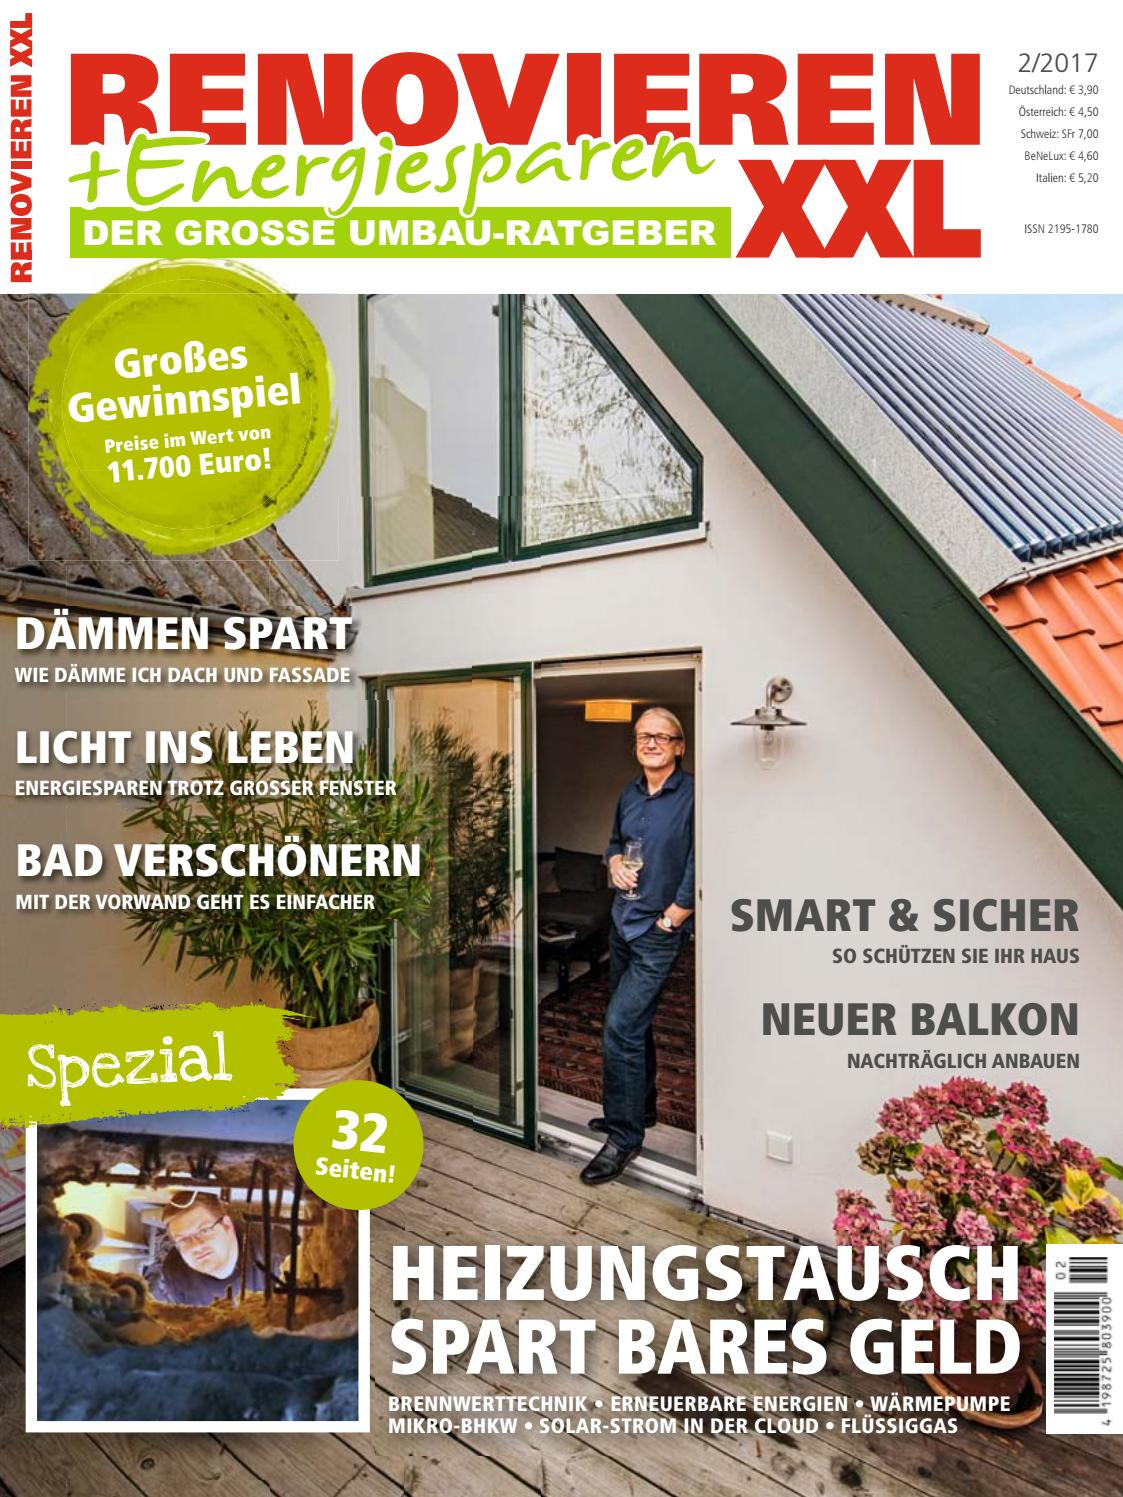 renovieren energiesparen 2 2017 by family home verlag gmbh issuu. Black Bedroom Furniture Sets. Home Design Ideas